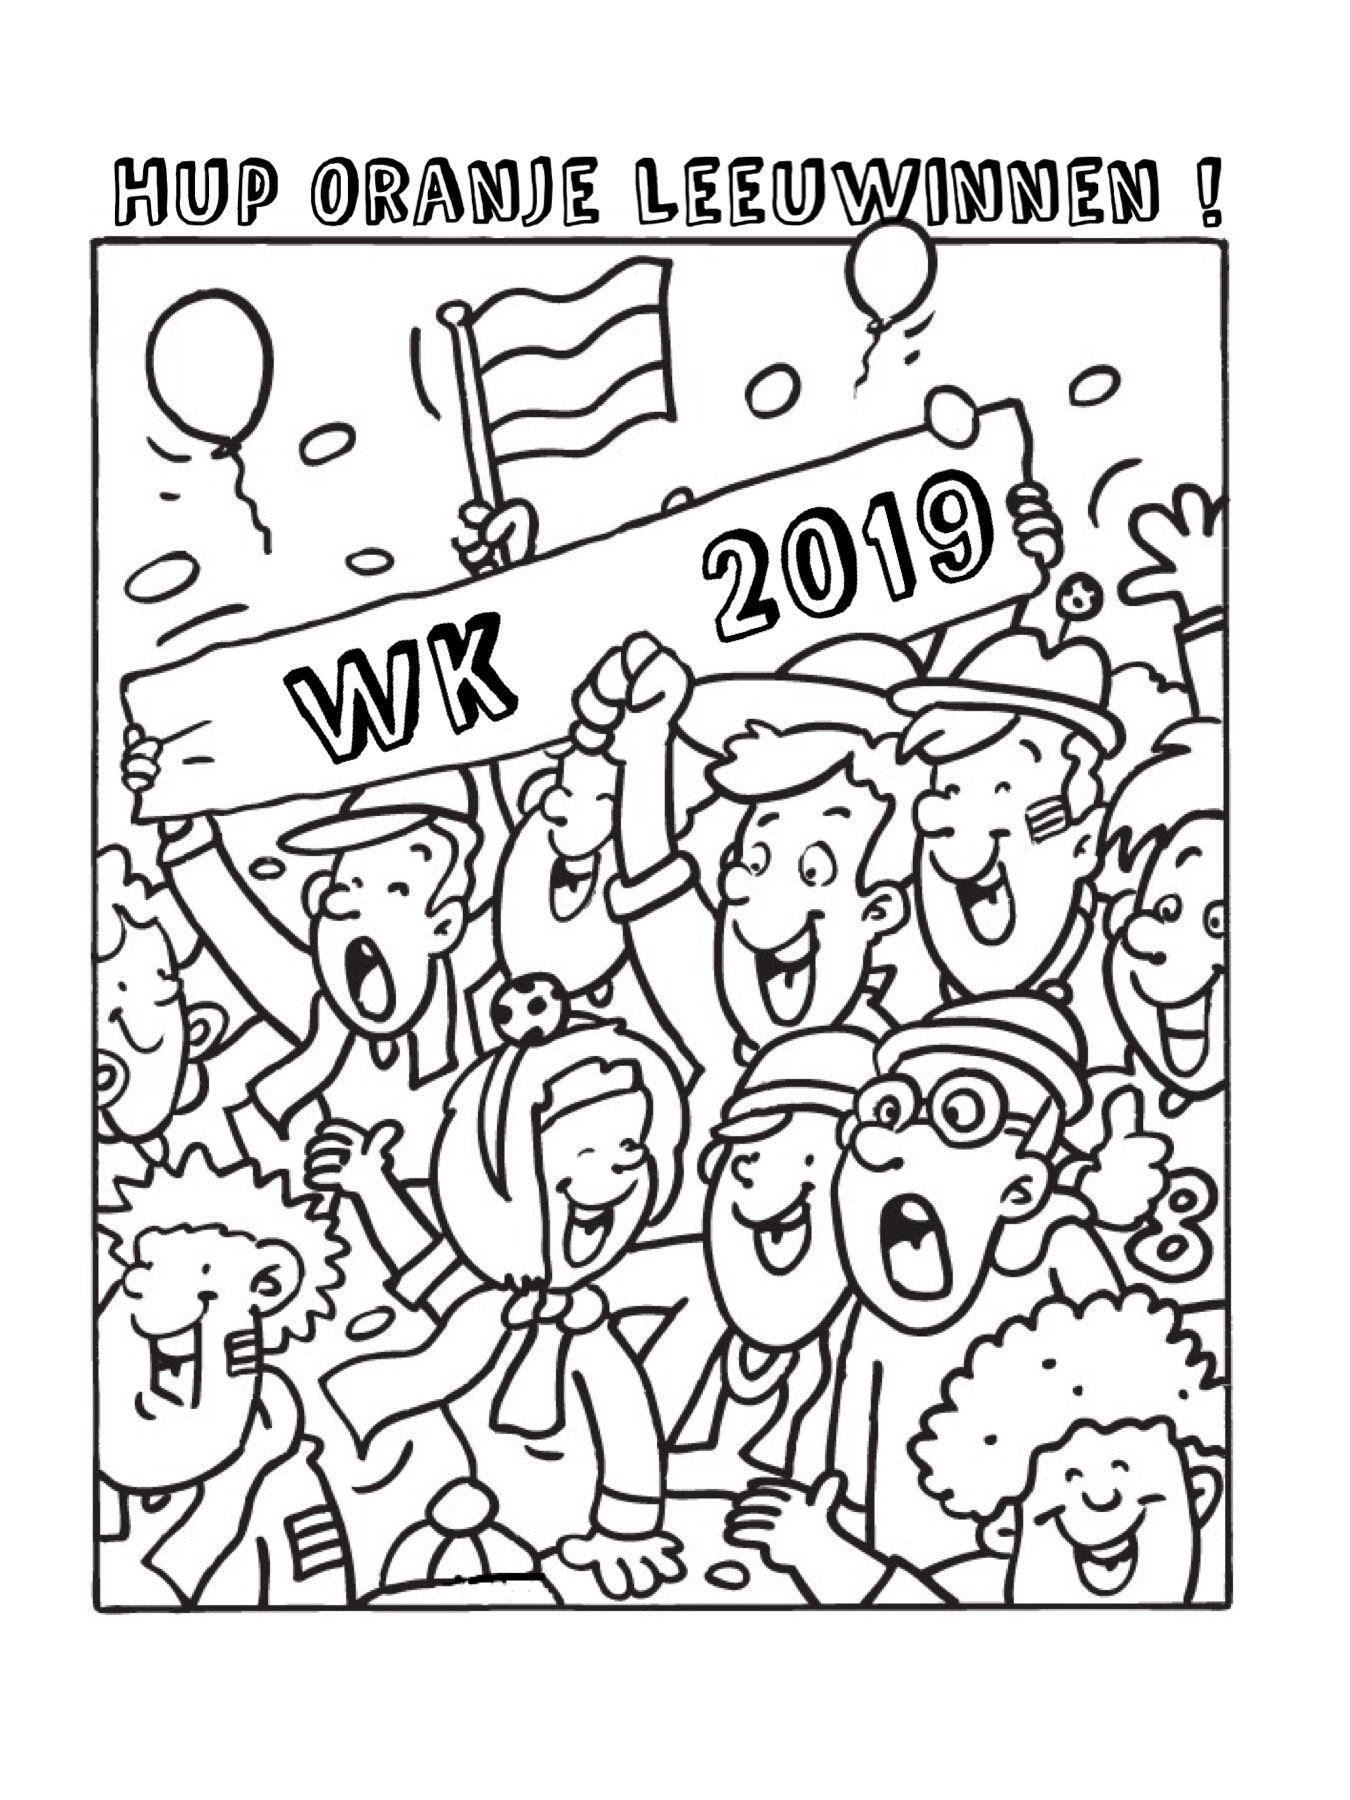 Kleurplaat Oranje Leeuwinnen Wk 2019 Voetbal Vrouwen Kleurplaten Vrouwenvoetbal Voetbal